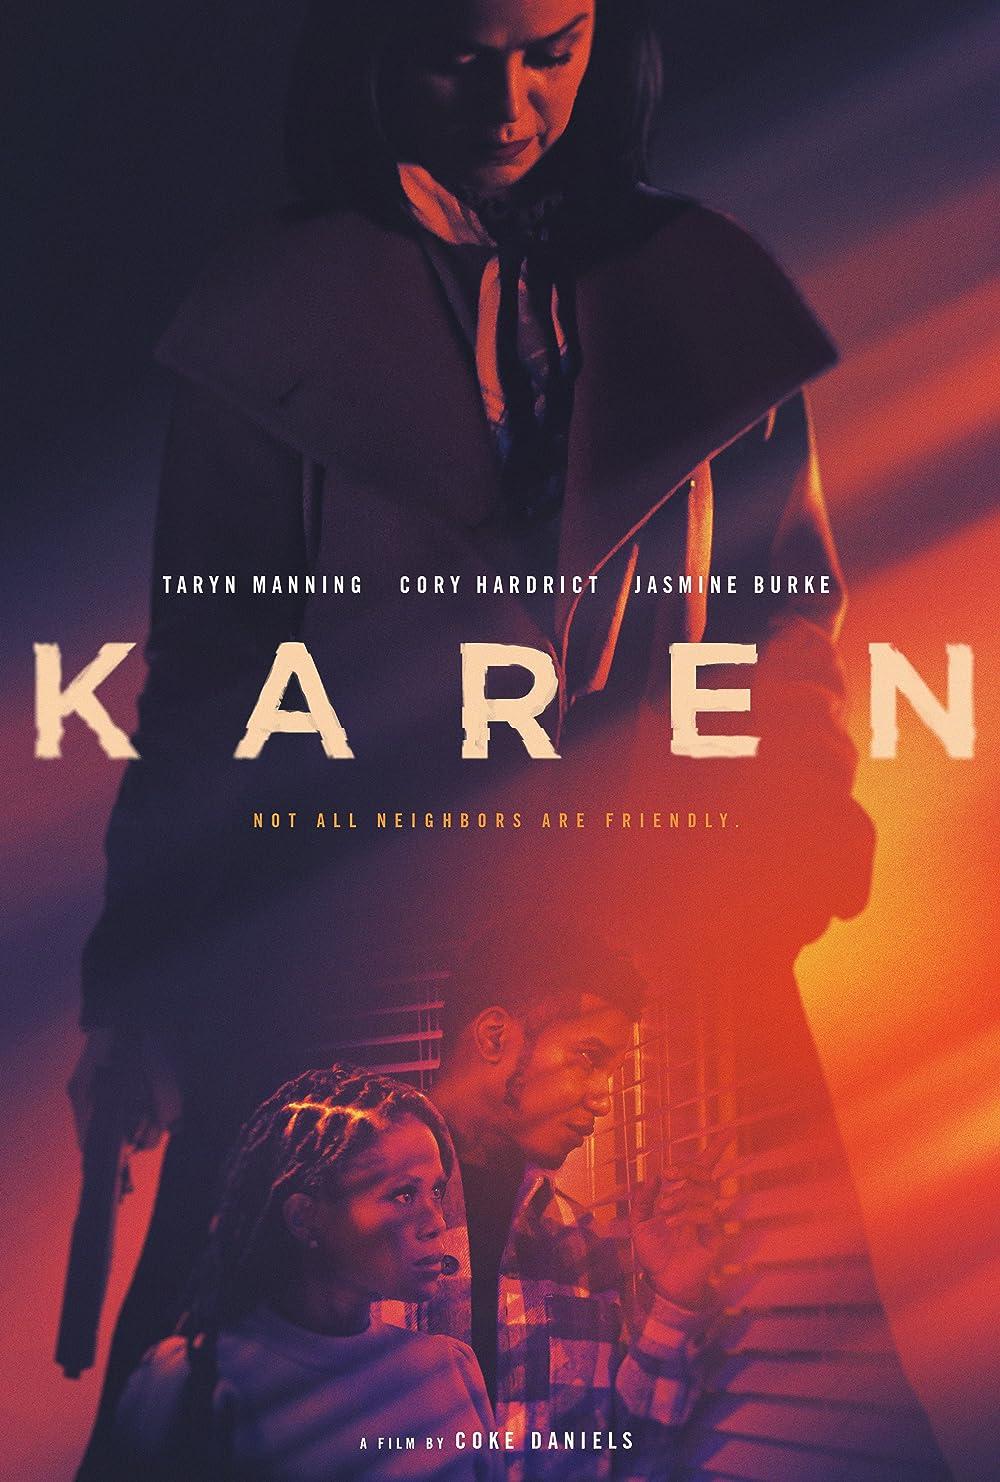 Download Karen (2021) Full Movie [In English] With Hindi Subtitles | WebRip 720p [1XBET] FREE on 1XCinema.com & KatMovieHD.sk